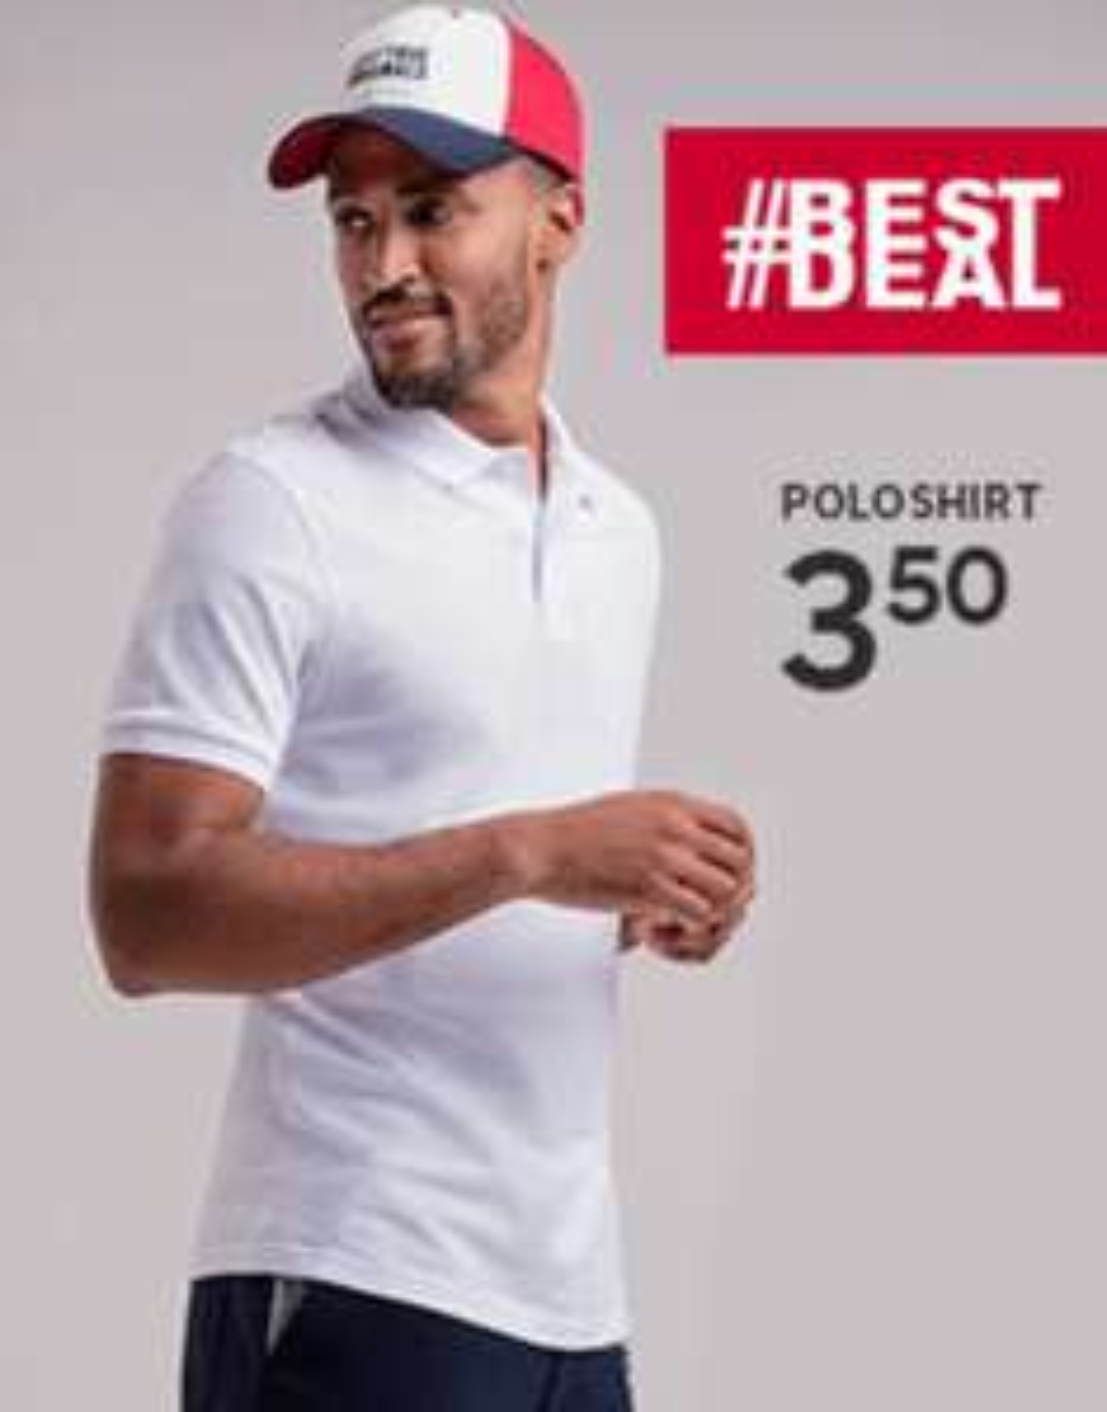 C & A Poloshirts für 3.50 €